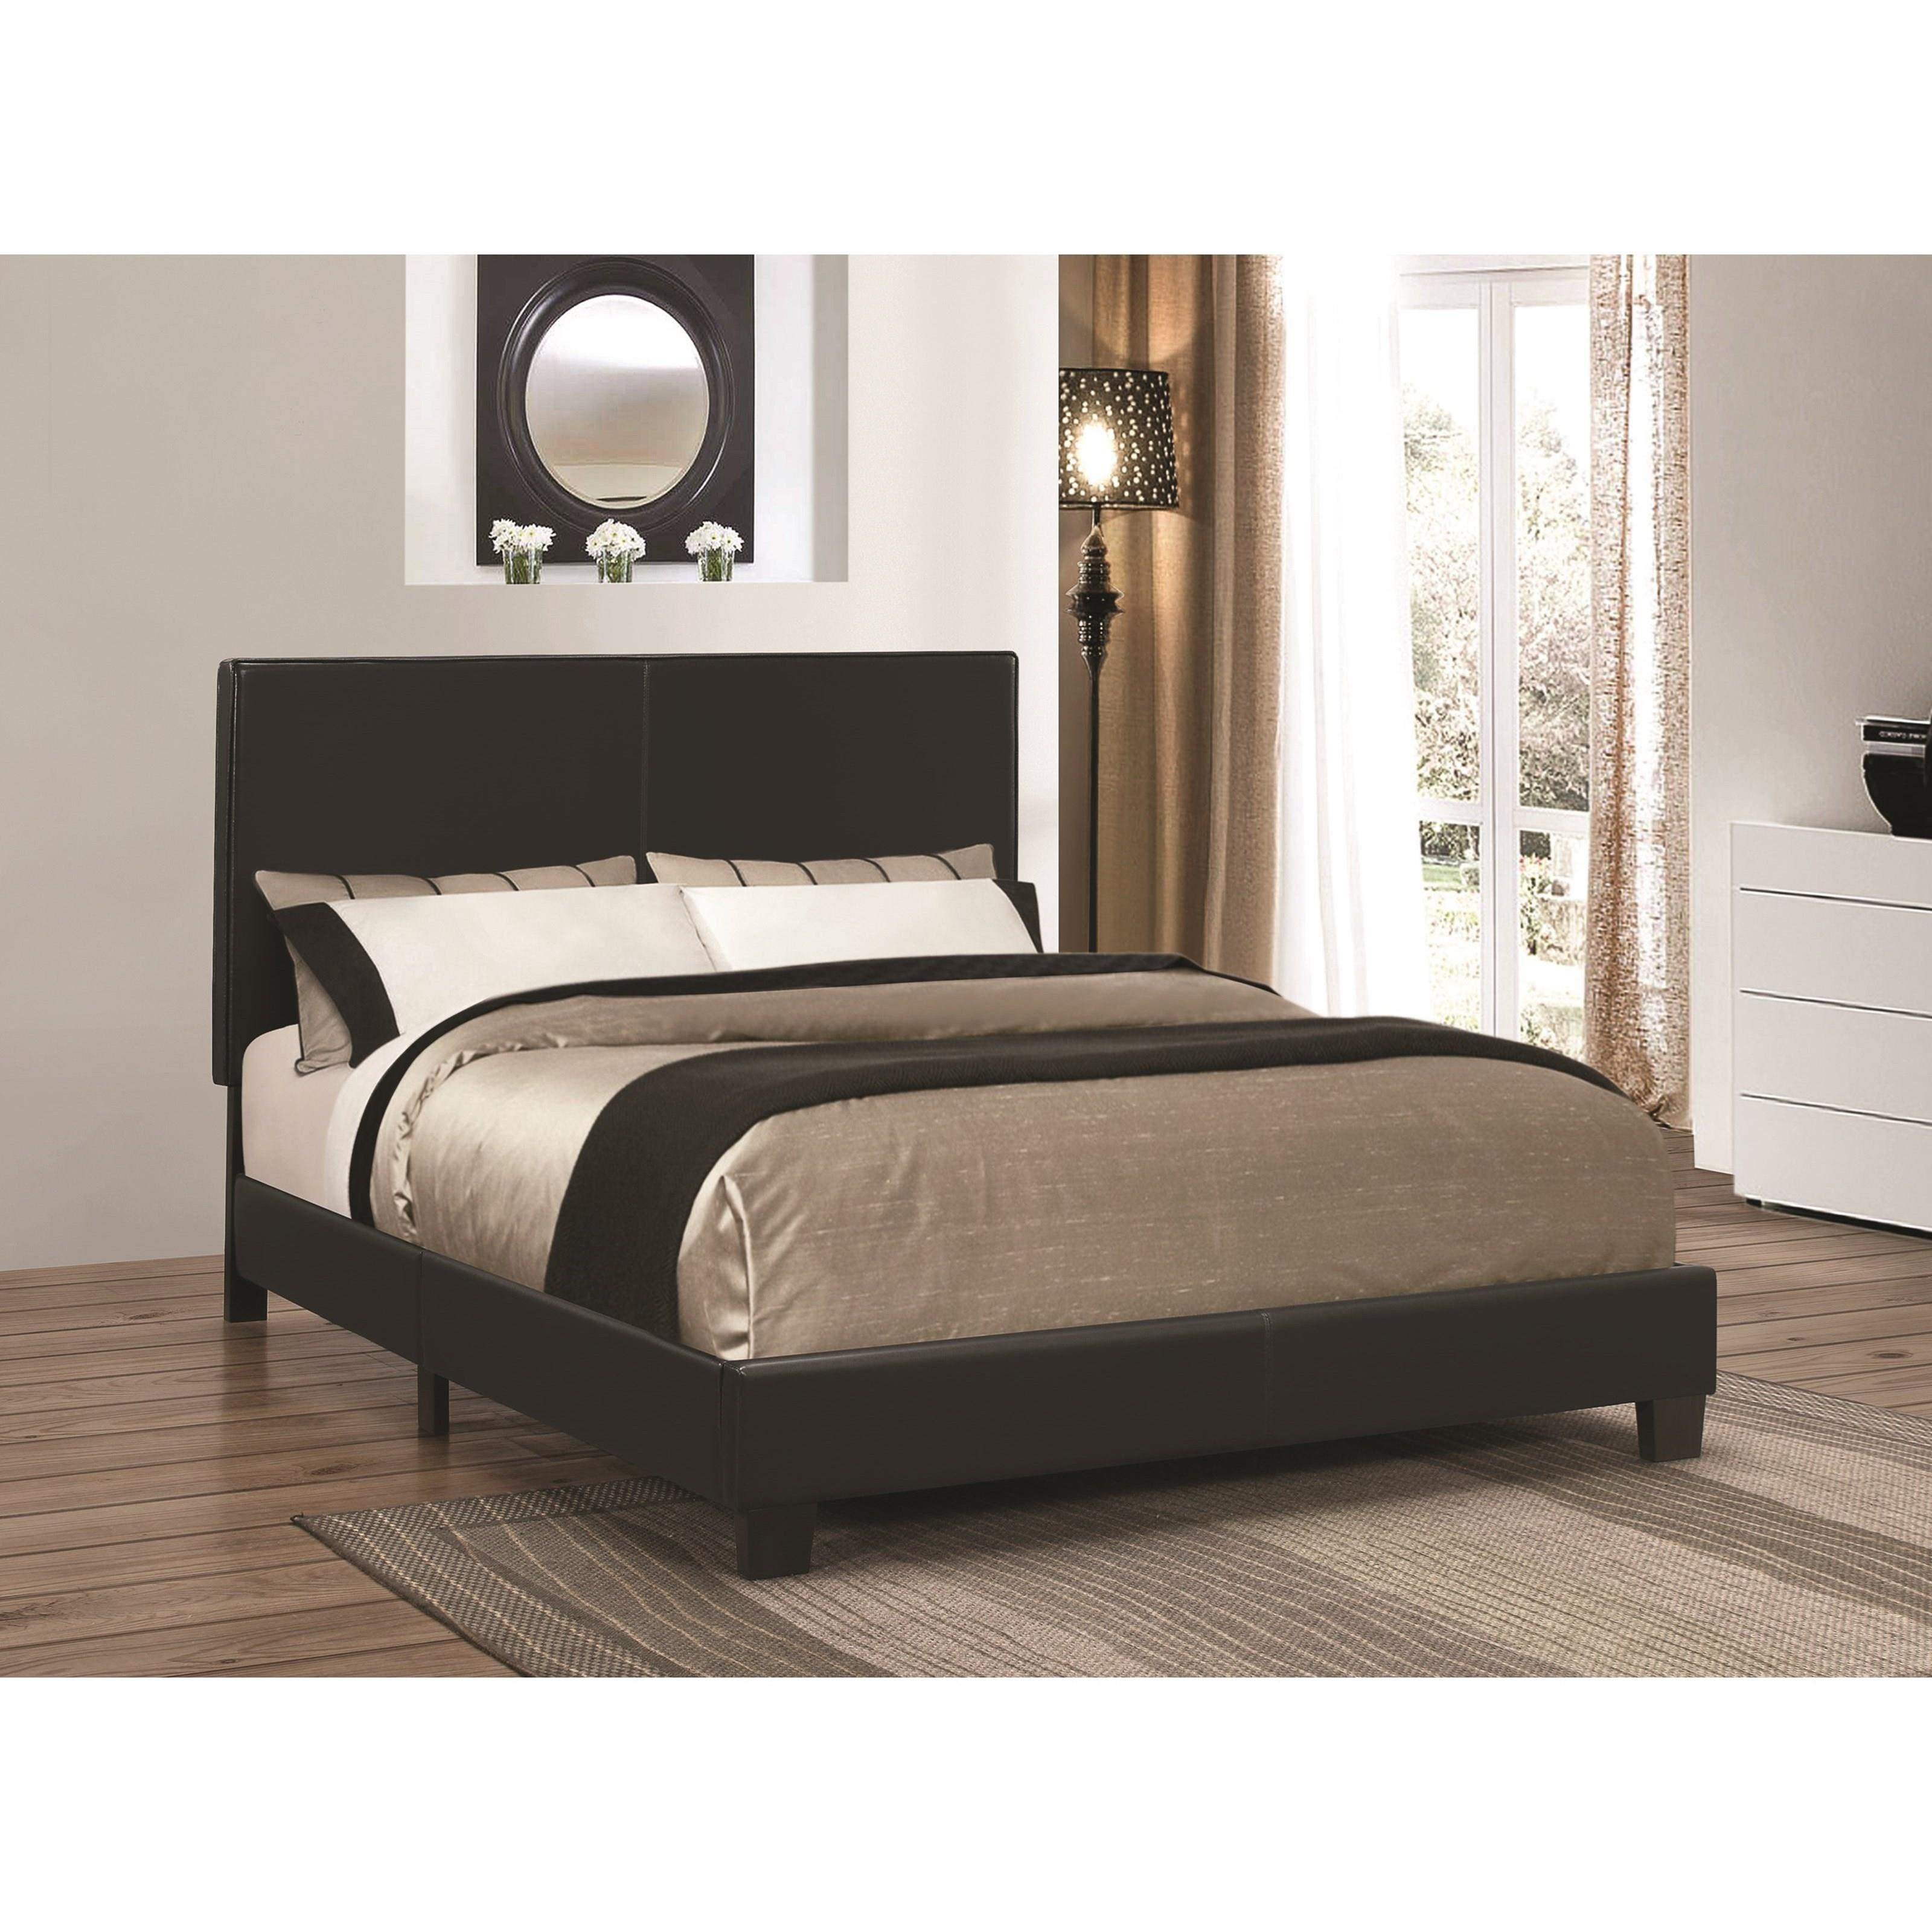 Coaster Upholstered Beds Full Bed - Item Number: 300558F